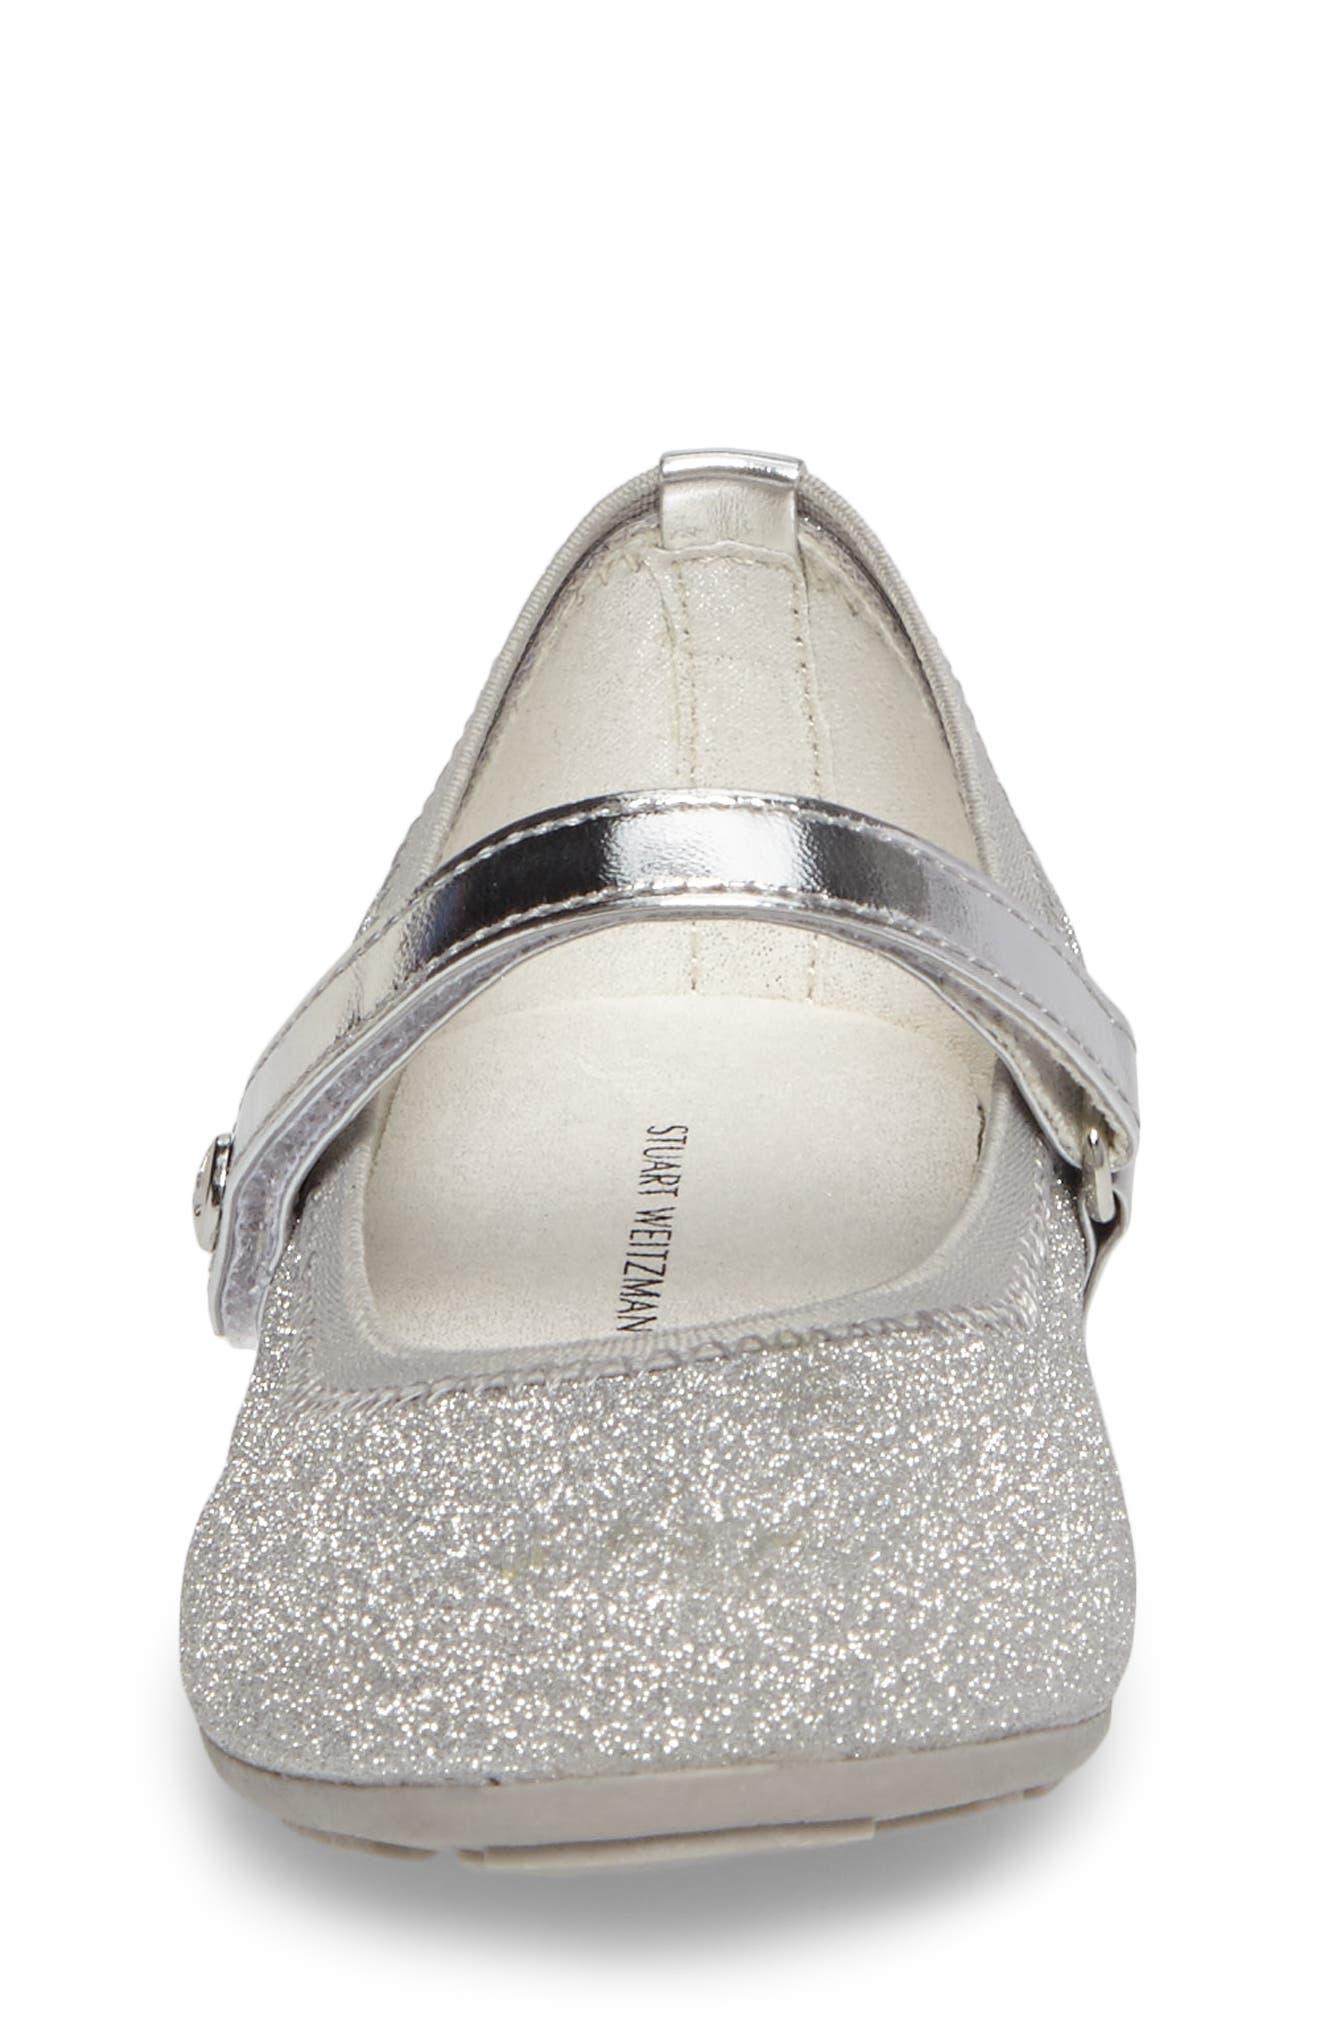 Fannie Dancer Glittery Mary Jane Ballet Flat,                             Alternate thumbnail 4, color,